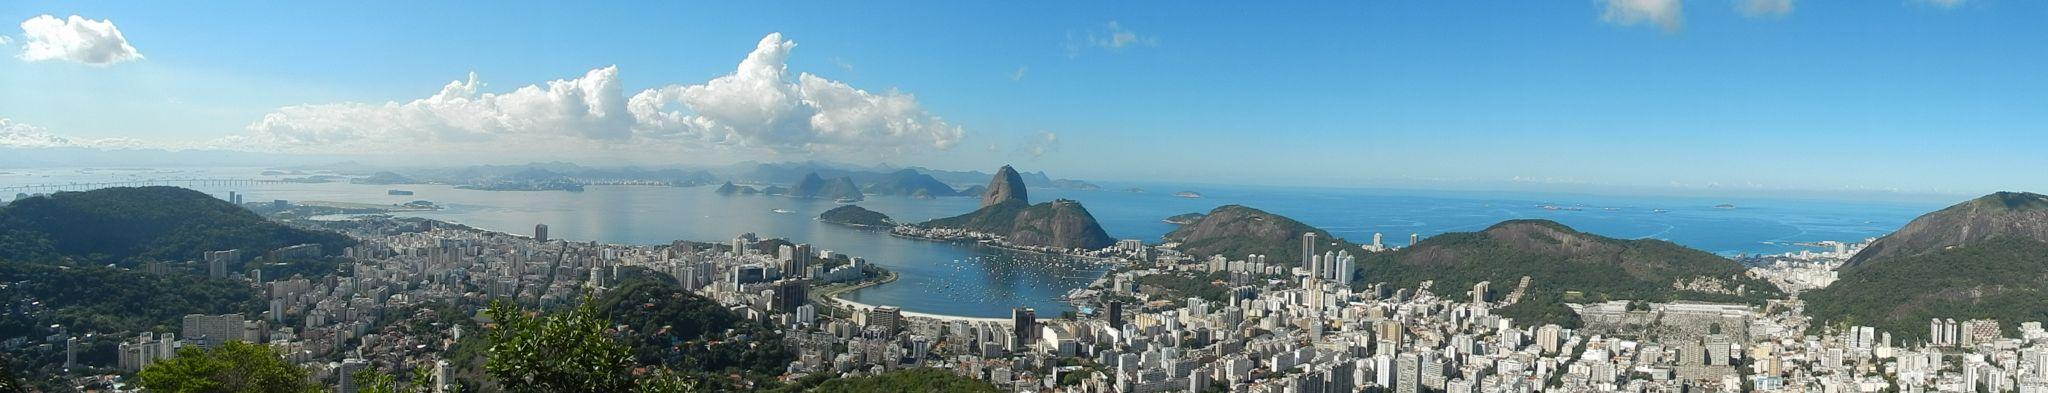 5 Restaurants in Rio de Janeiro to eat traditional Brazilian cuisine- Footloose Lemon Juice